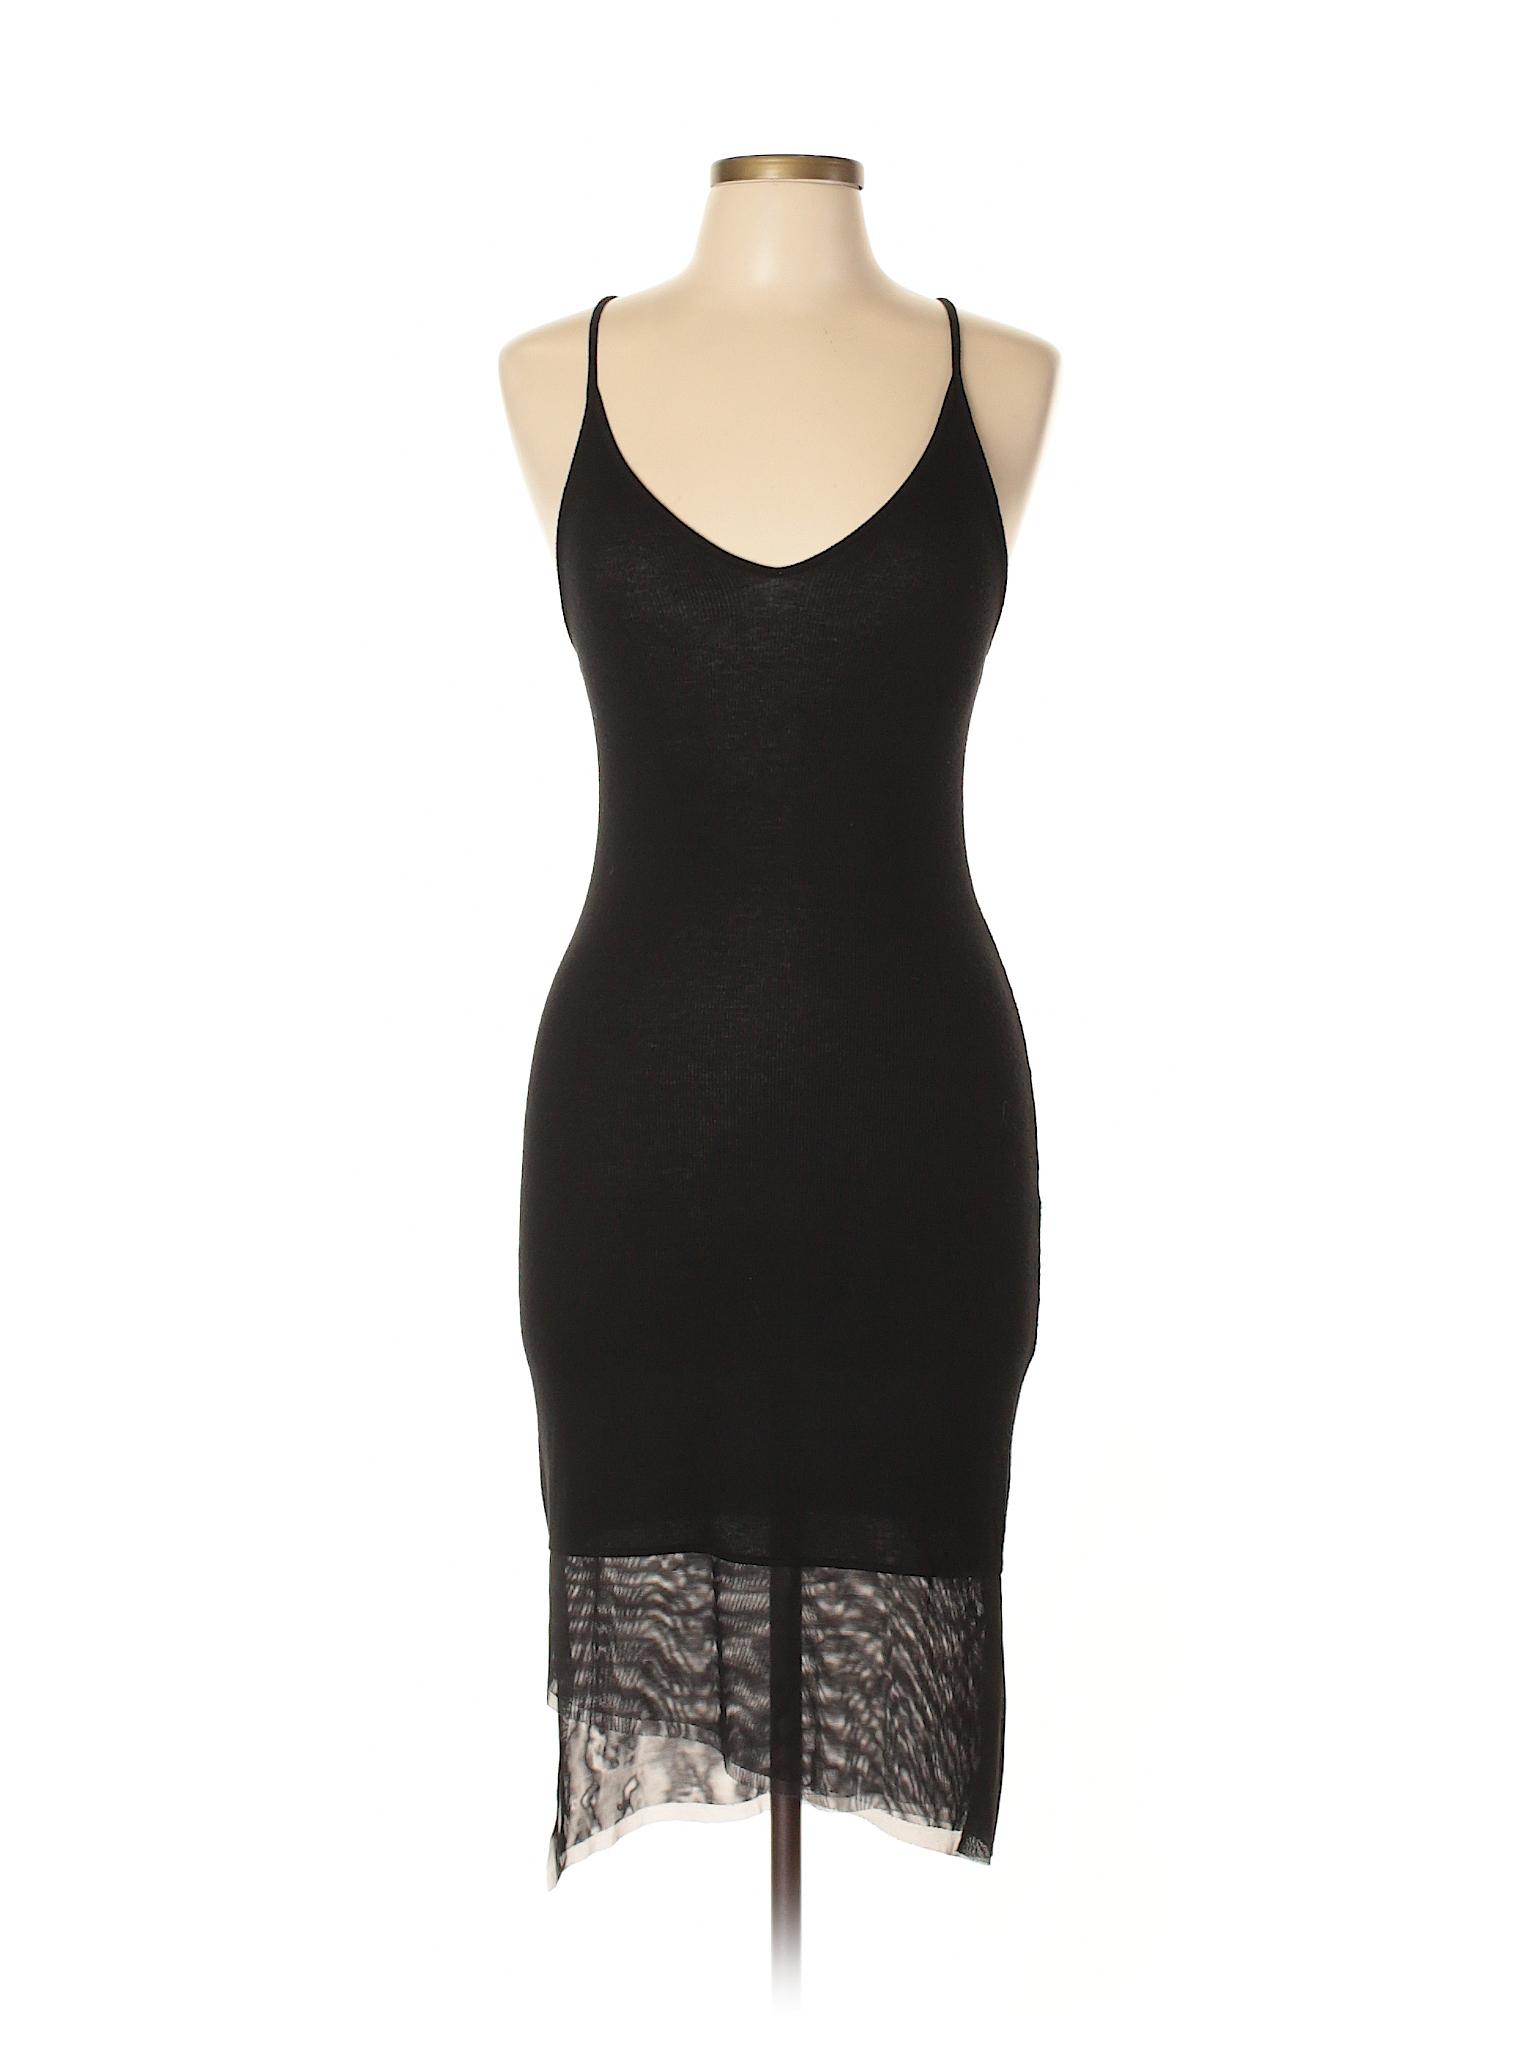 Casual Selling BCBGMAXAZRIA BCBGMAXAZRIA Dress BCBGMAXAZRIA Selling Casual Dress Selling wnOq1T0T